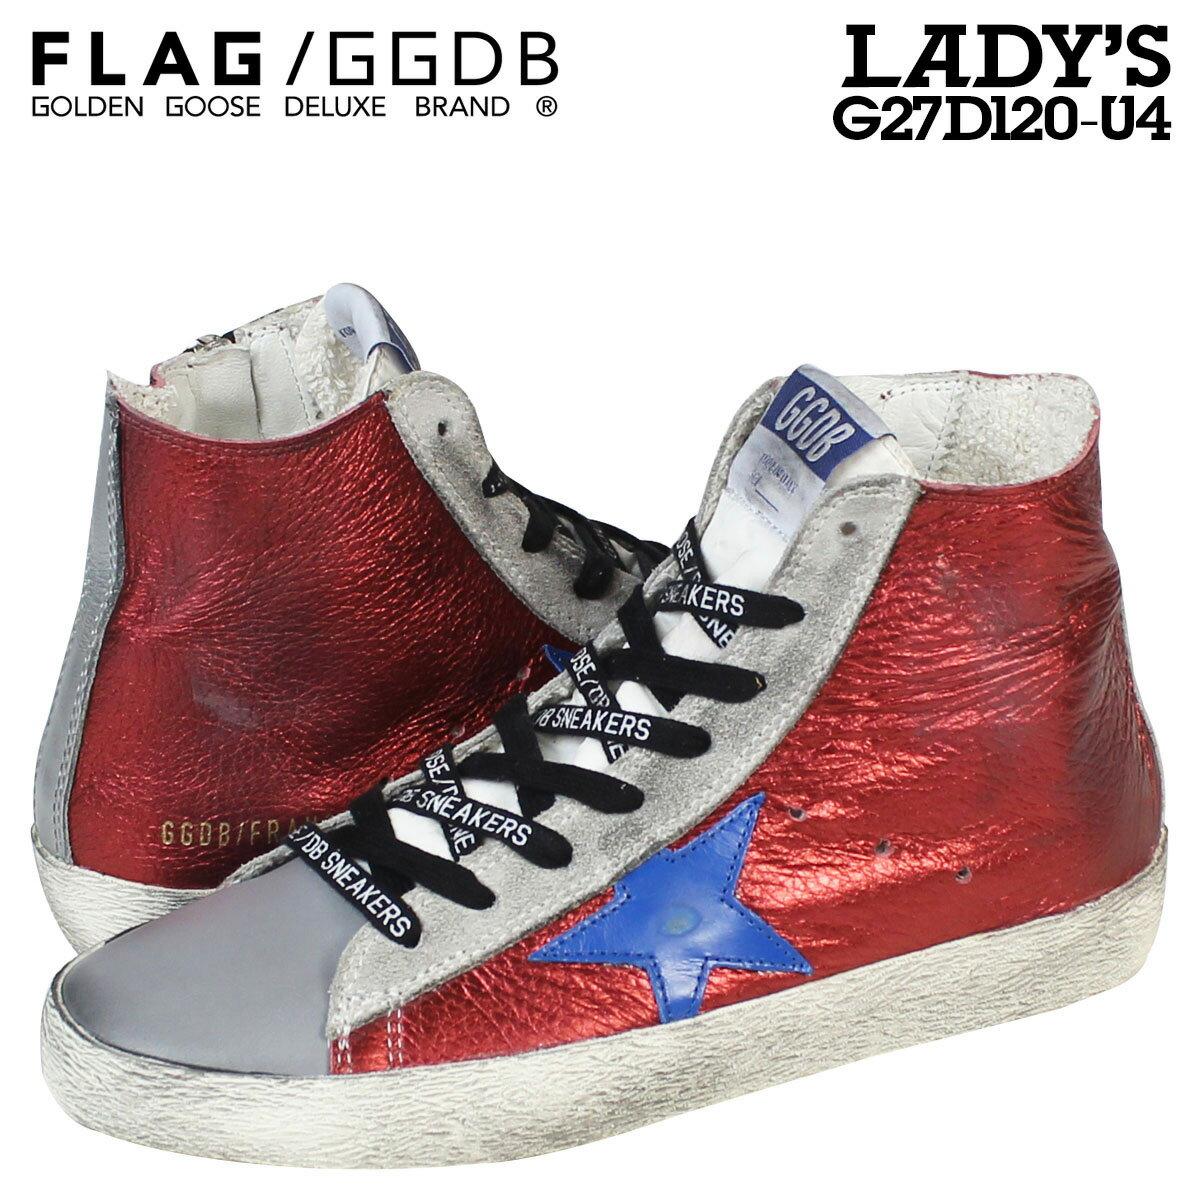 Golden Goose ゴールデングース スニーカー レディース FRANCY イタリア製 G27D120 U4 靴 レッド グレー 【CLEARANCE】